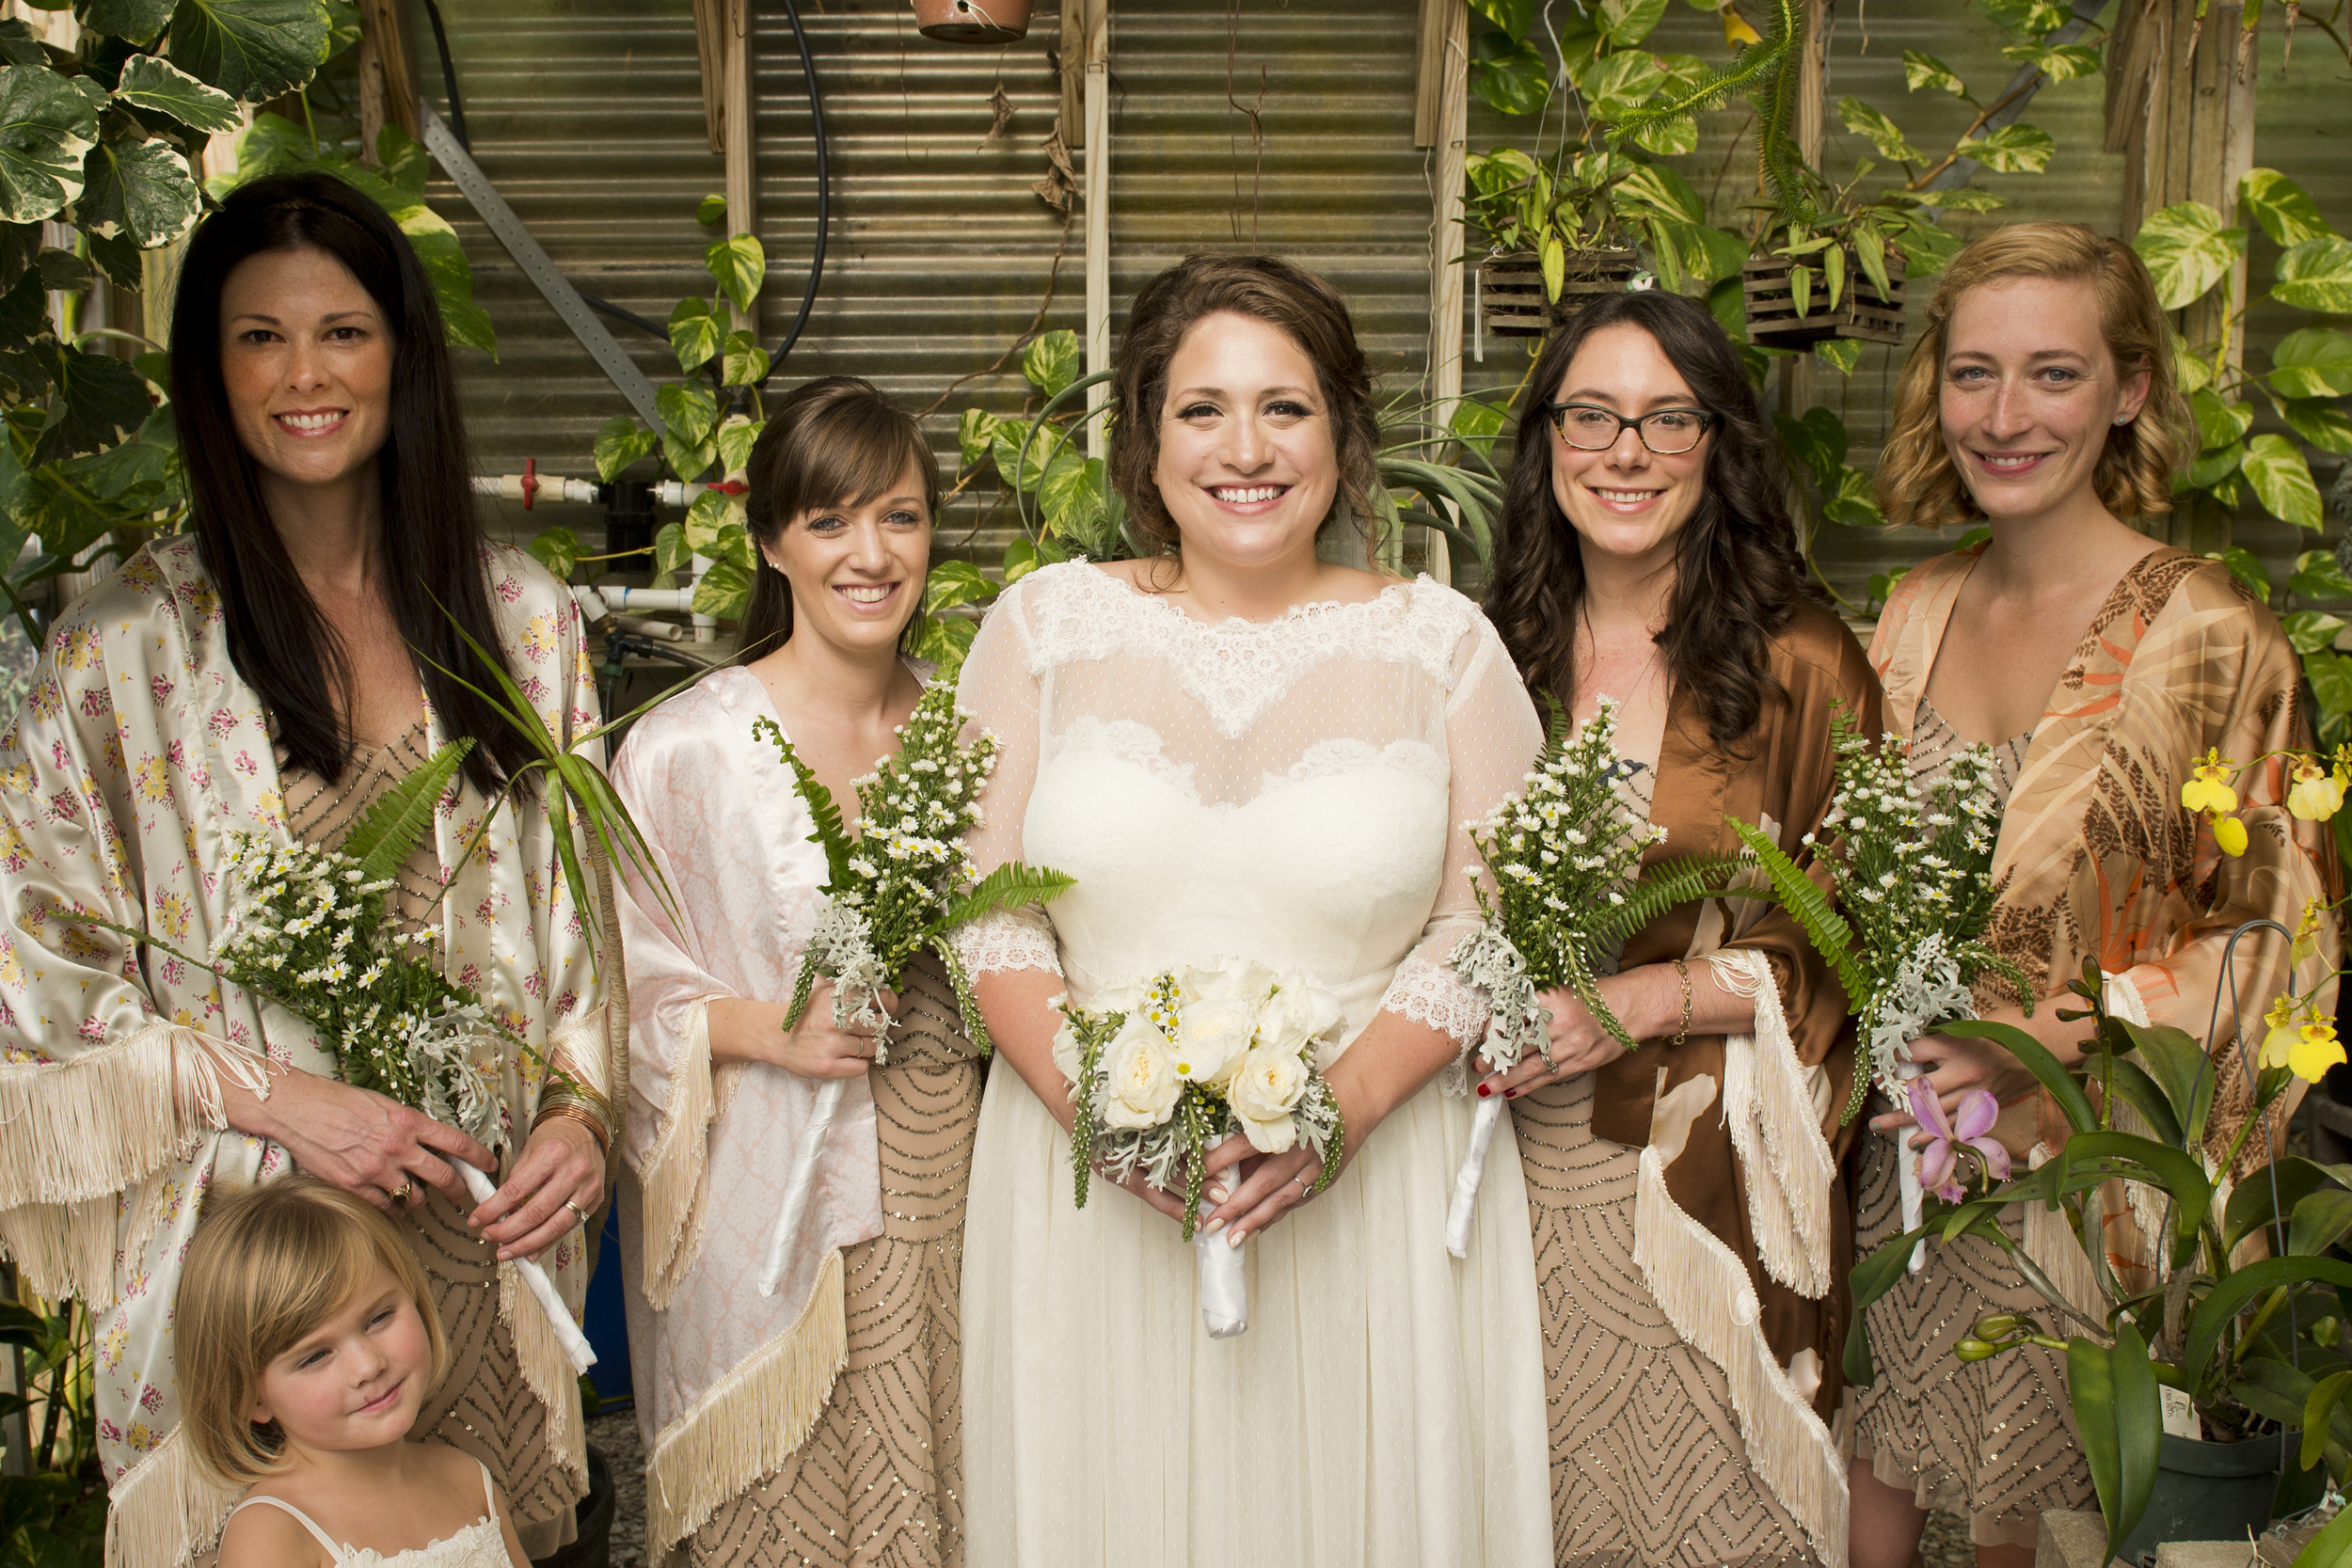 Caroline-Kilgore-photography-ivory-and-beau-bridal-boutique-savannah-wedding-dresses-savannah-bridal-boutique-savannah-wedding-gowns-custom-wedding-dress-vintage-wedding-dress-swiss-dot-wedding-dress-shrimp-boat-wedding.jpg